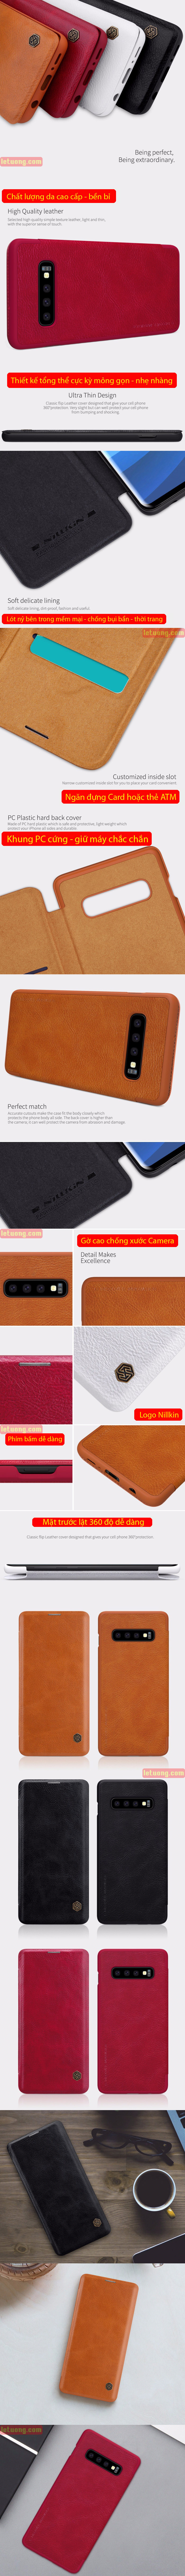 Bao da Galaxy S10 Plus Nillkin Qin Leather sang trọng - cổ điển 3